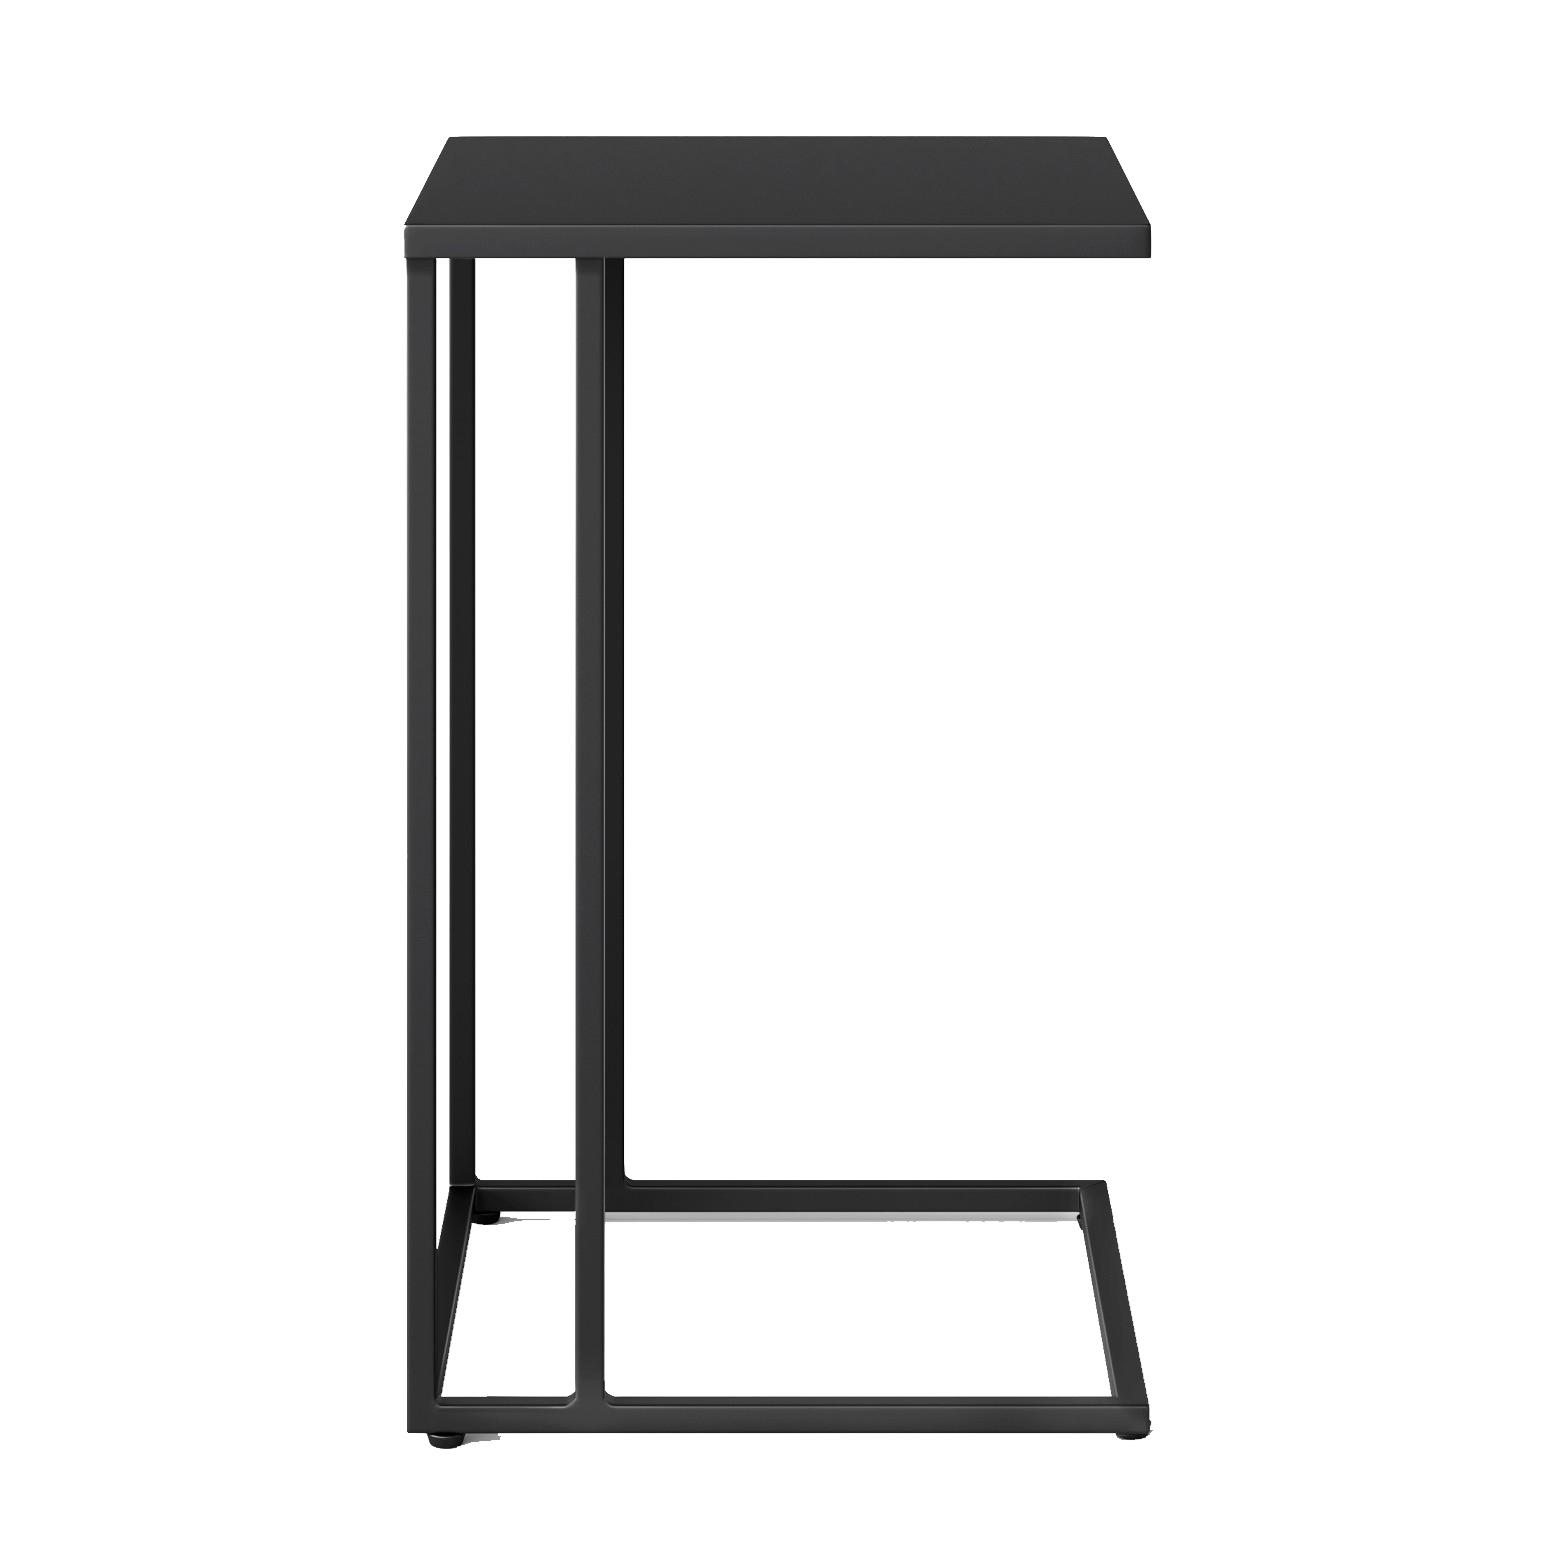 BLACK METAL STEEL FRAME C-TABLE | QTY 4 | $30